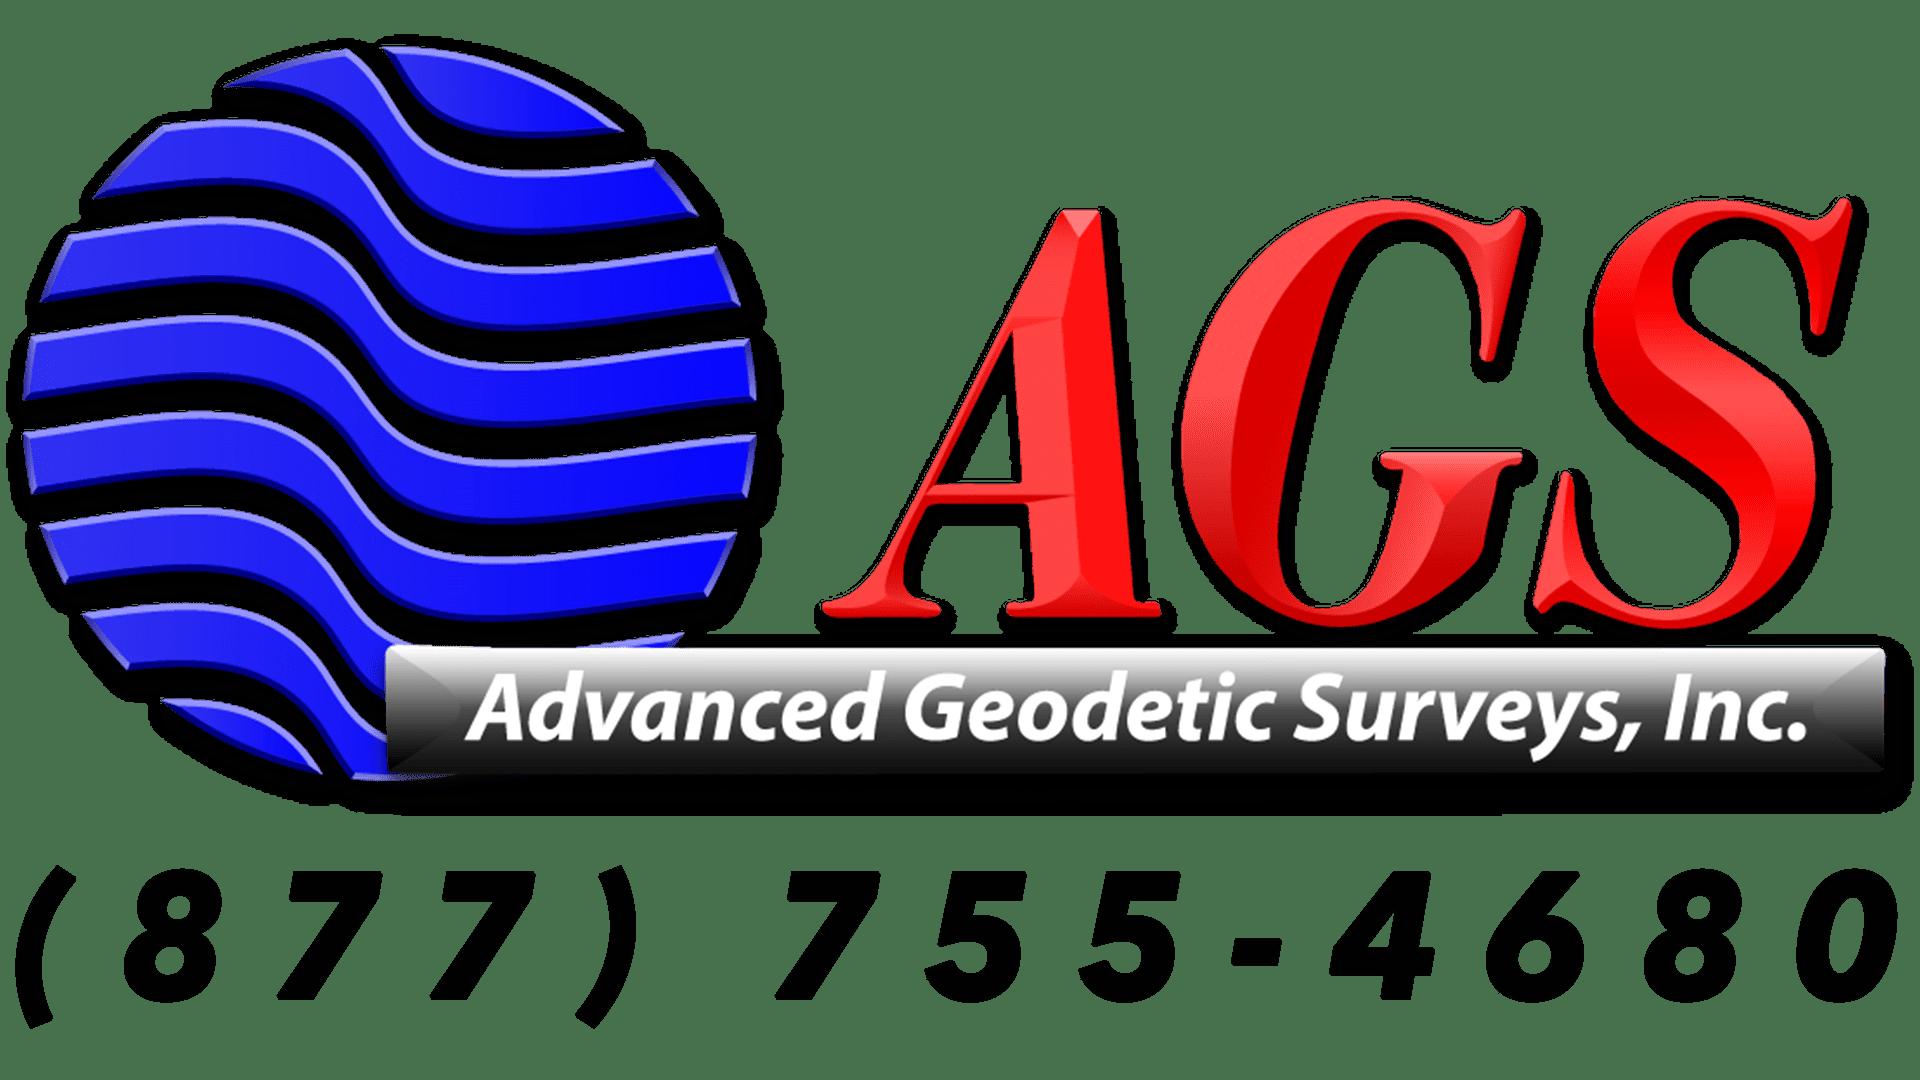 Trimble Survey Equipment Rentals + GPS Survey Equipment